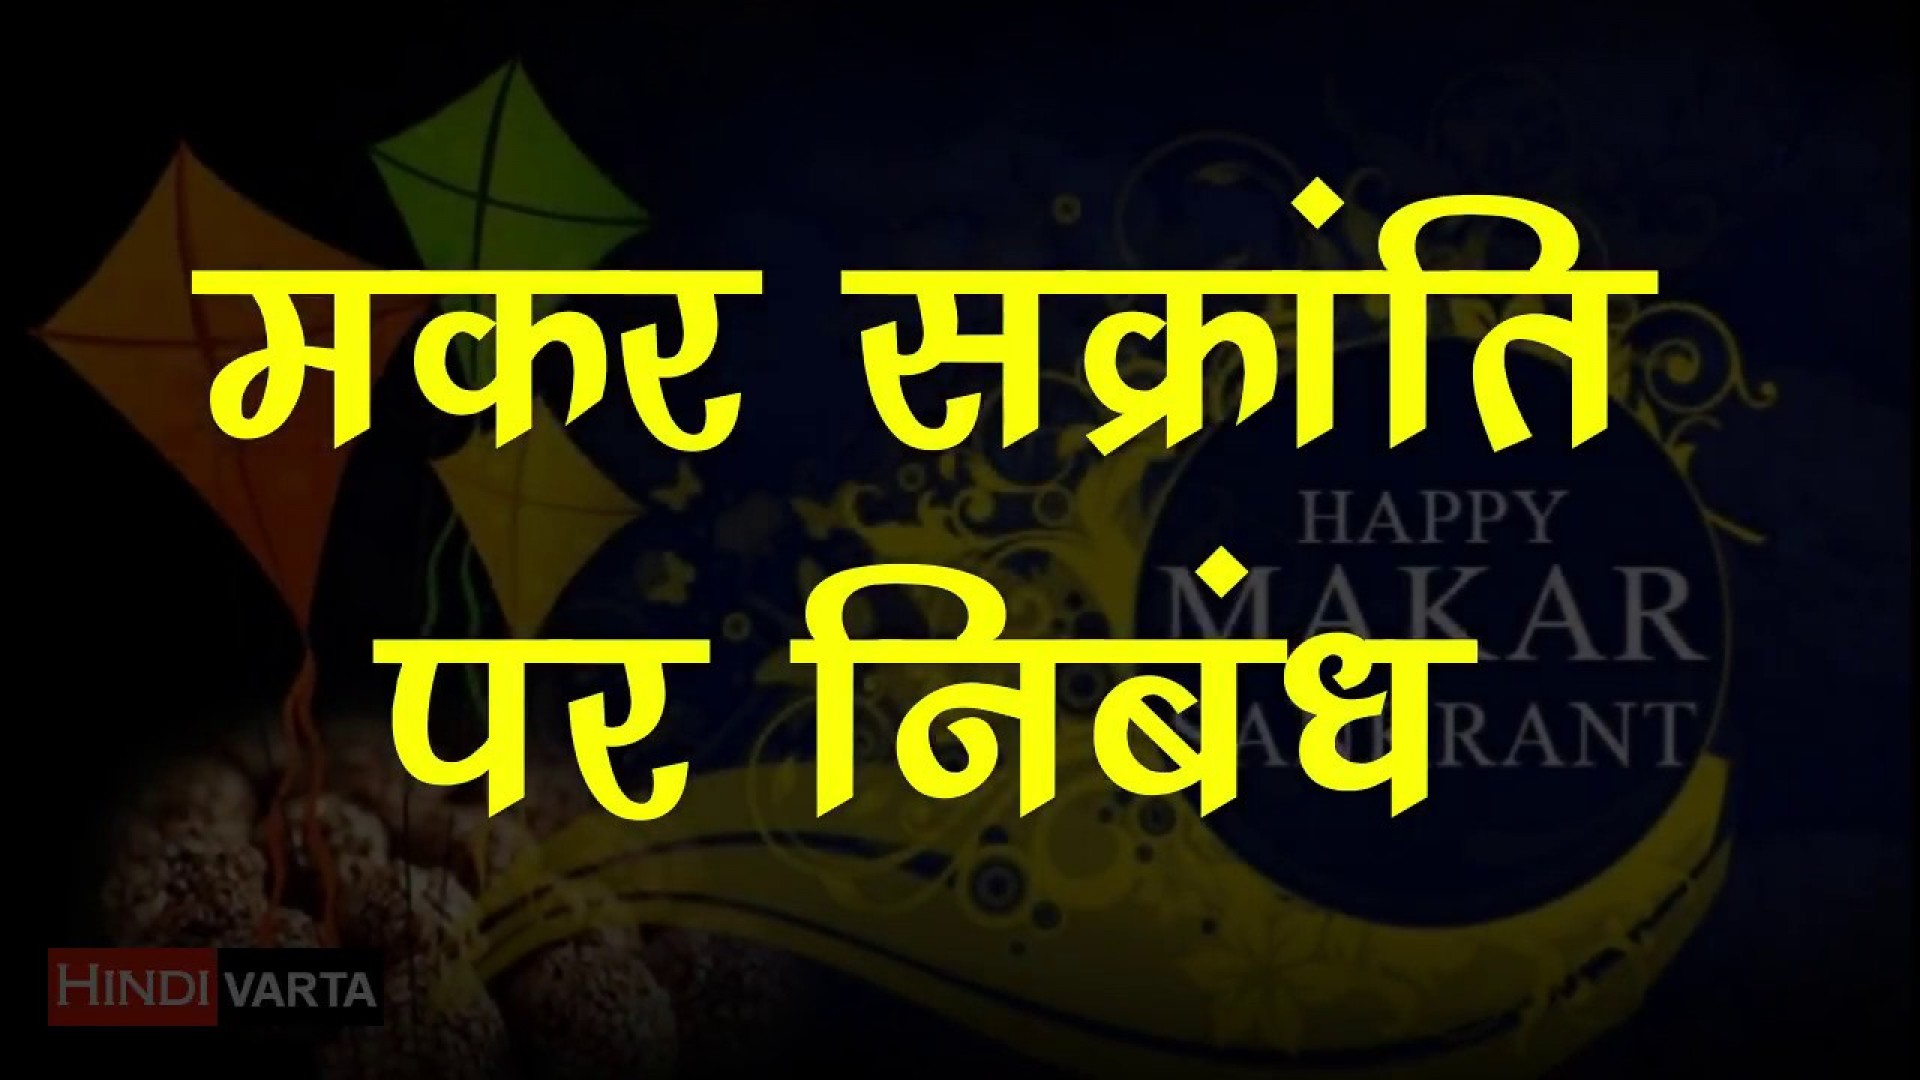 013 Makar Sankranti In Hindi Essay Example Surprising Pdf Download 2018 1920